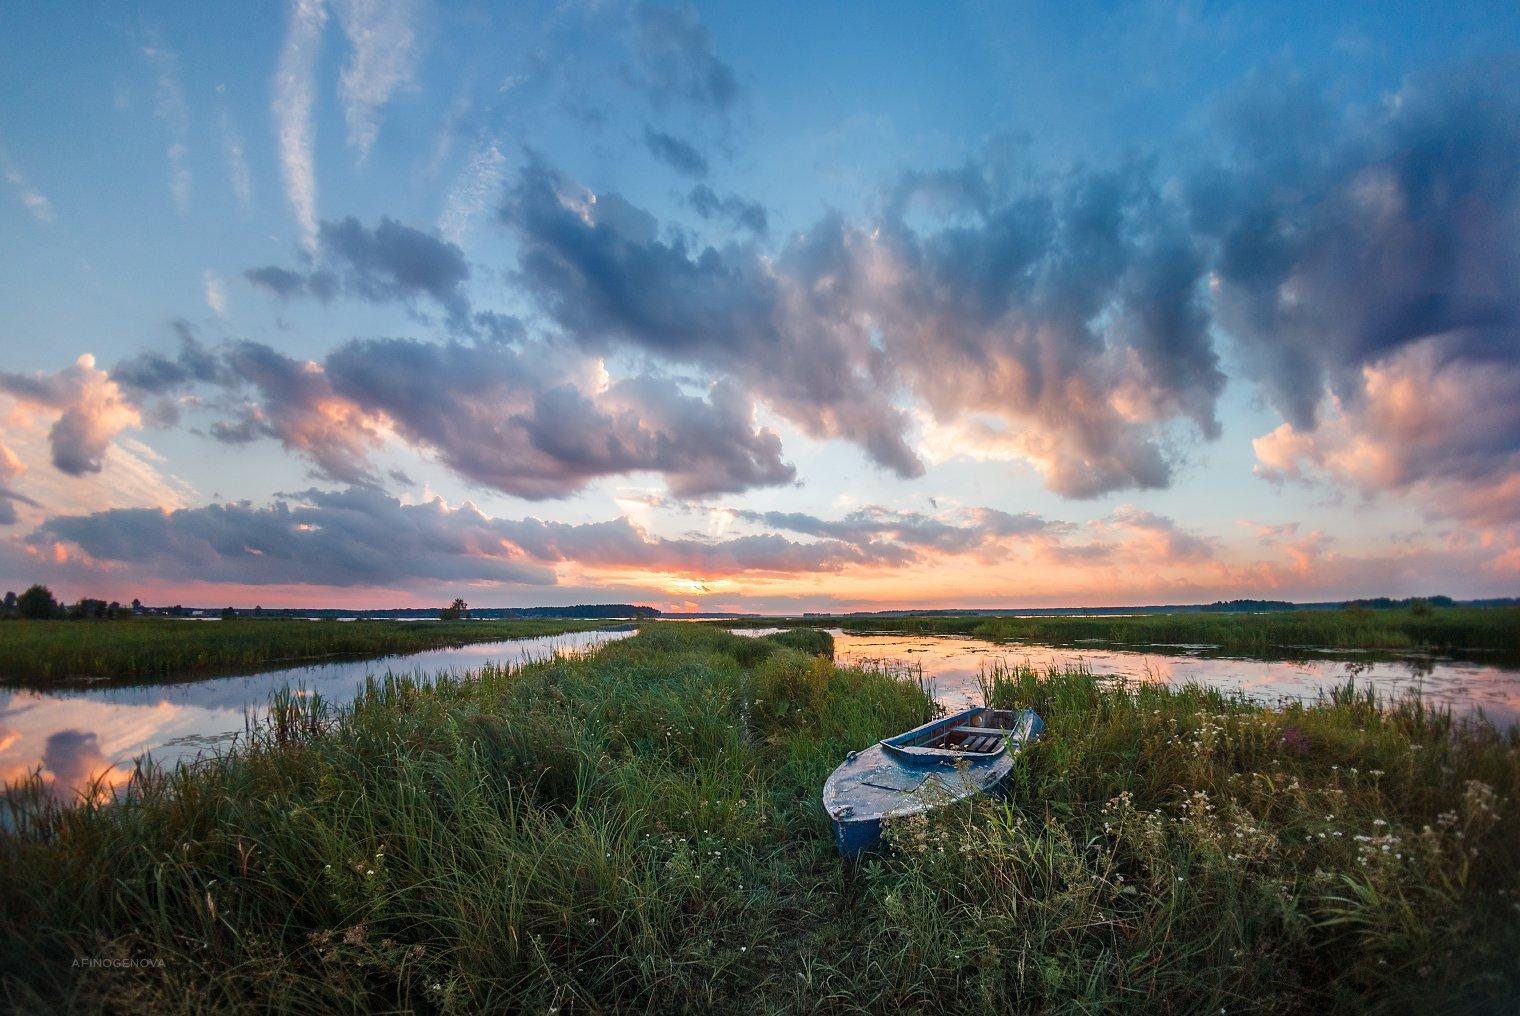 утро рассвет берег лодка небо облака пеленг, Афиногенова Татьяна